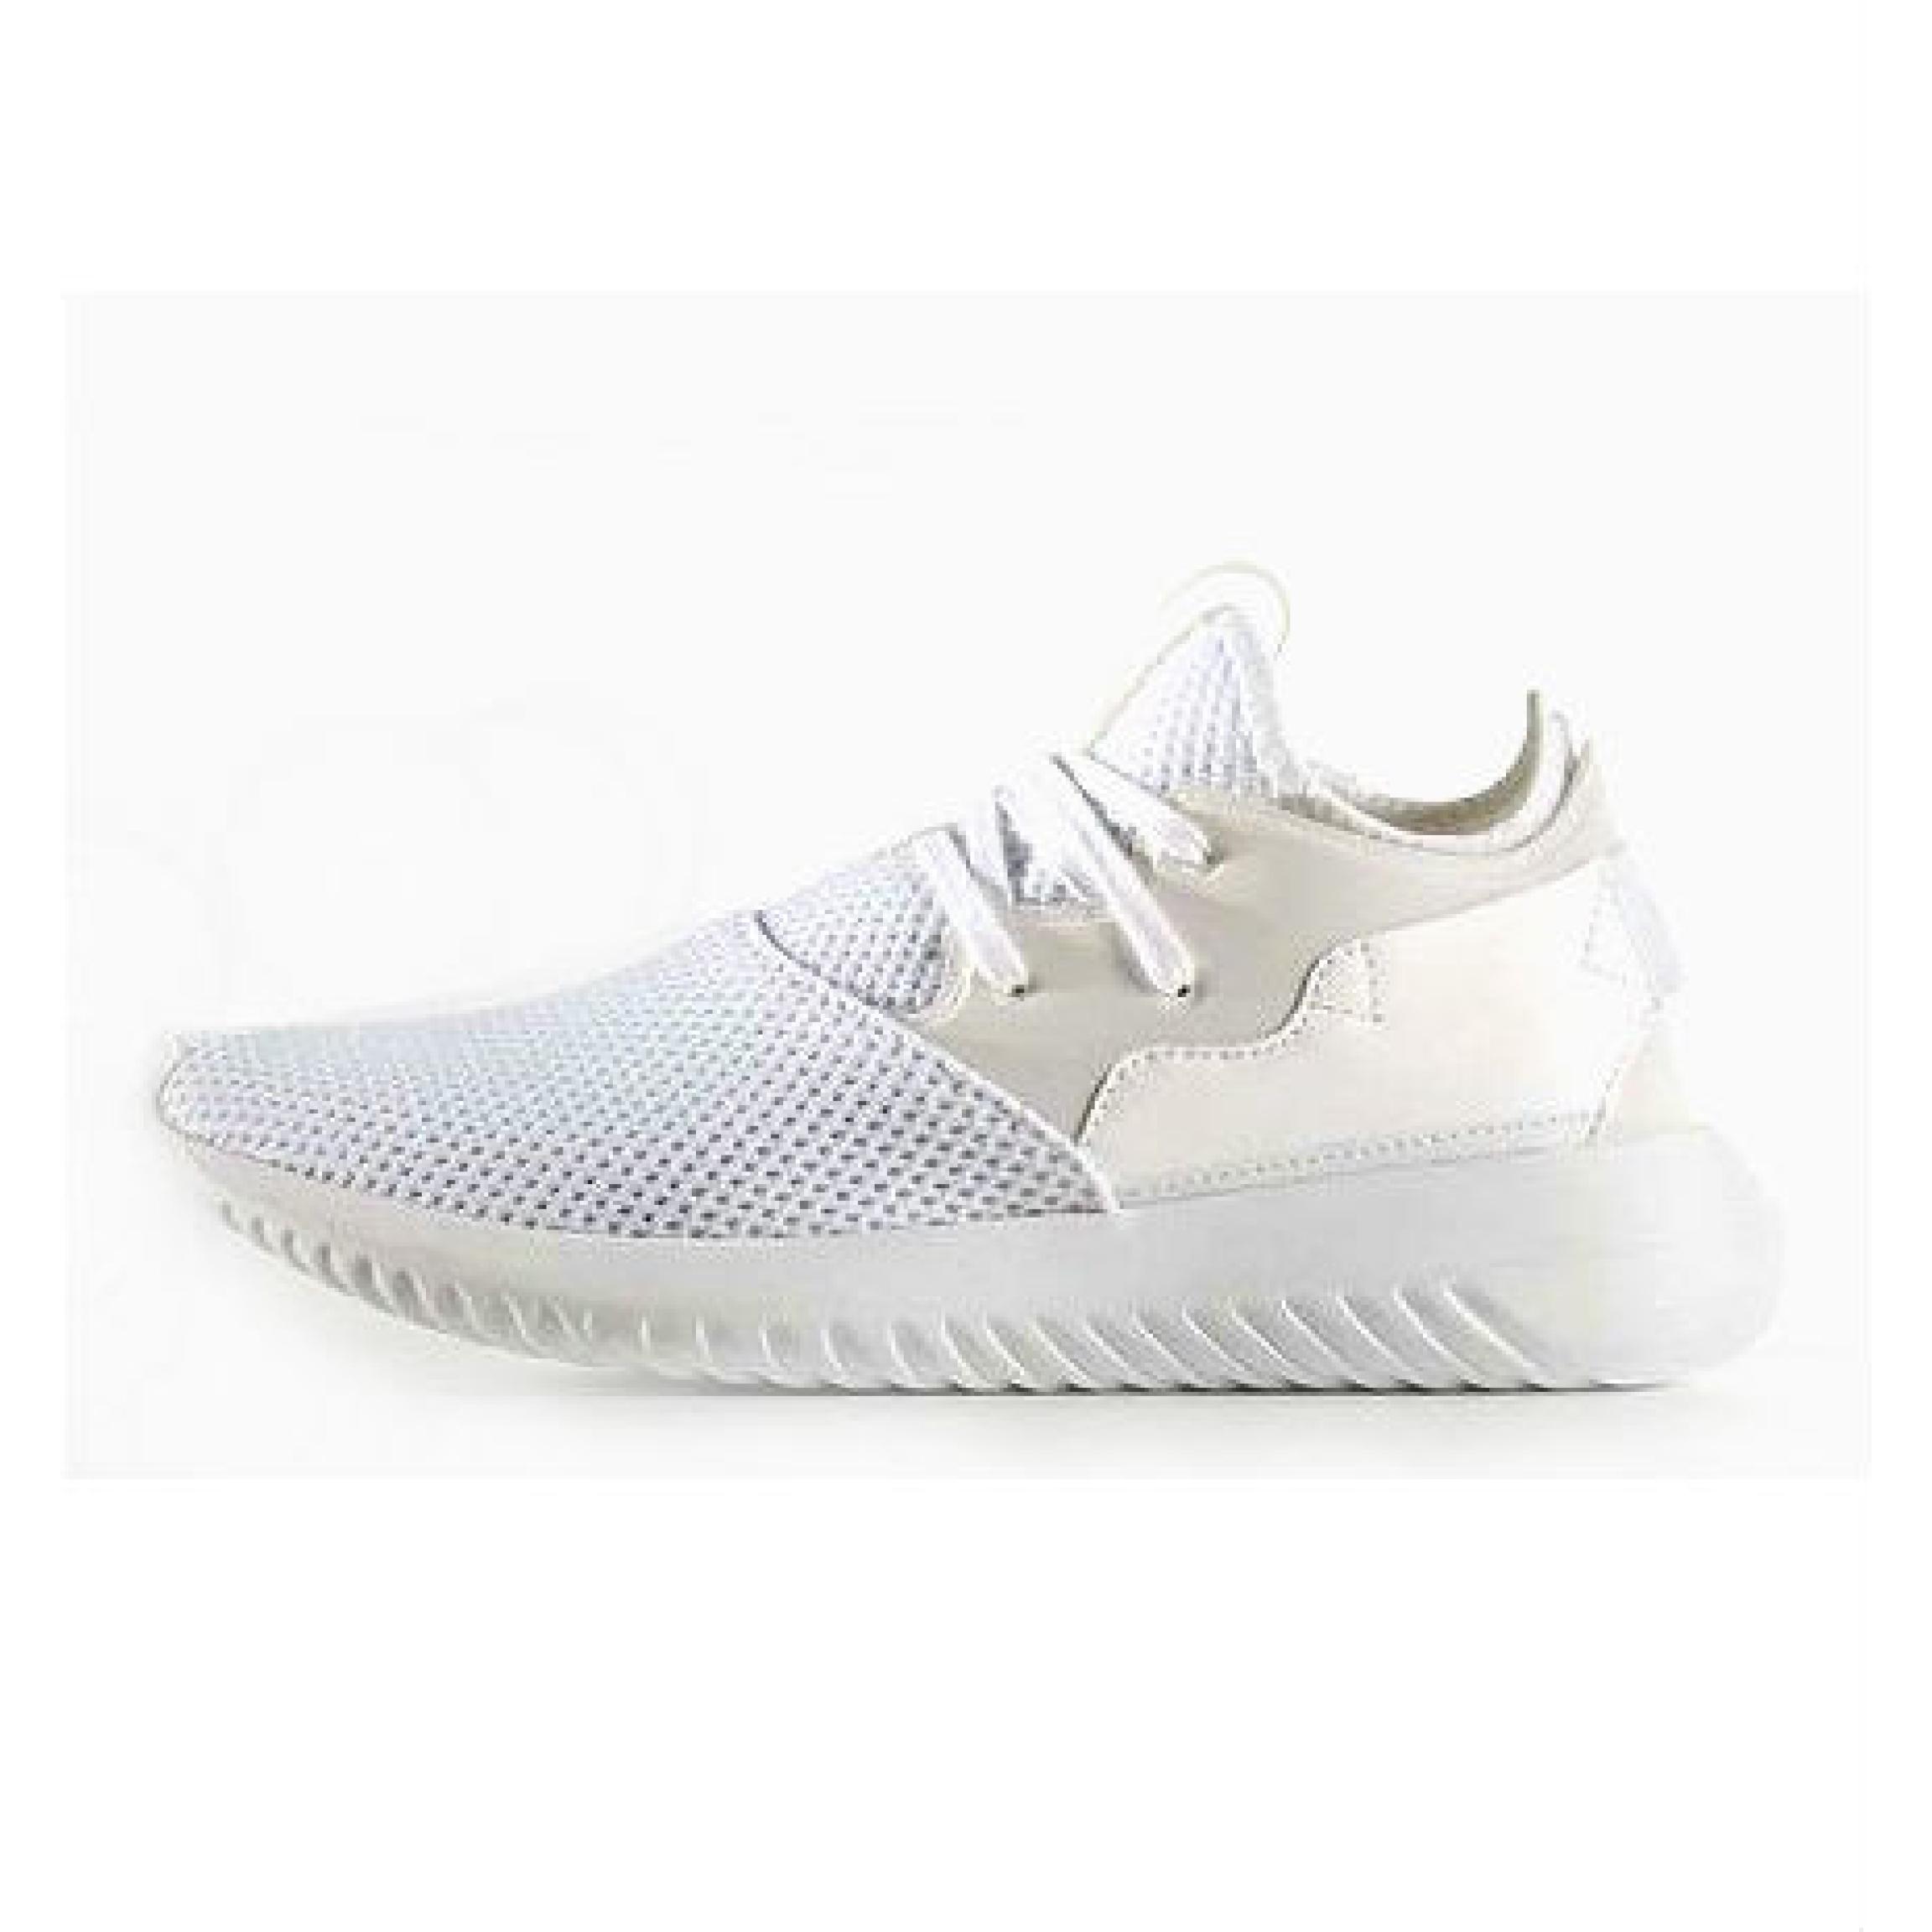 separation shoes 7ed61 e0c1a Adidas Women's Originals Shoes Adidas White Ftw/White Tubular Entrap BA7099  – US5